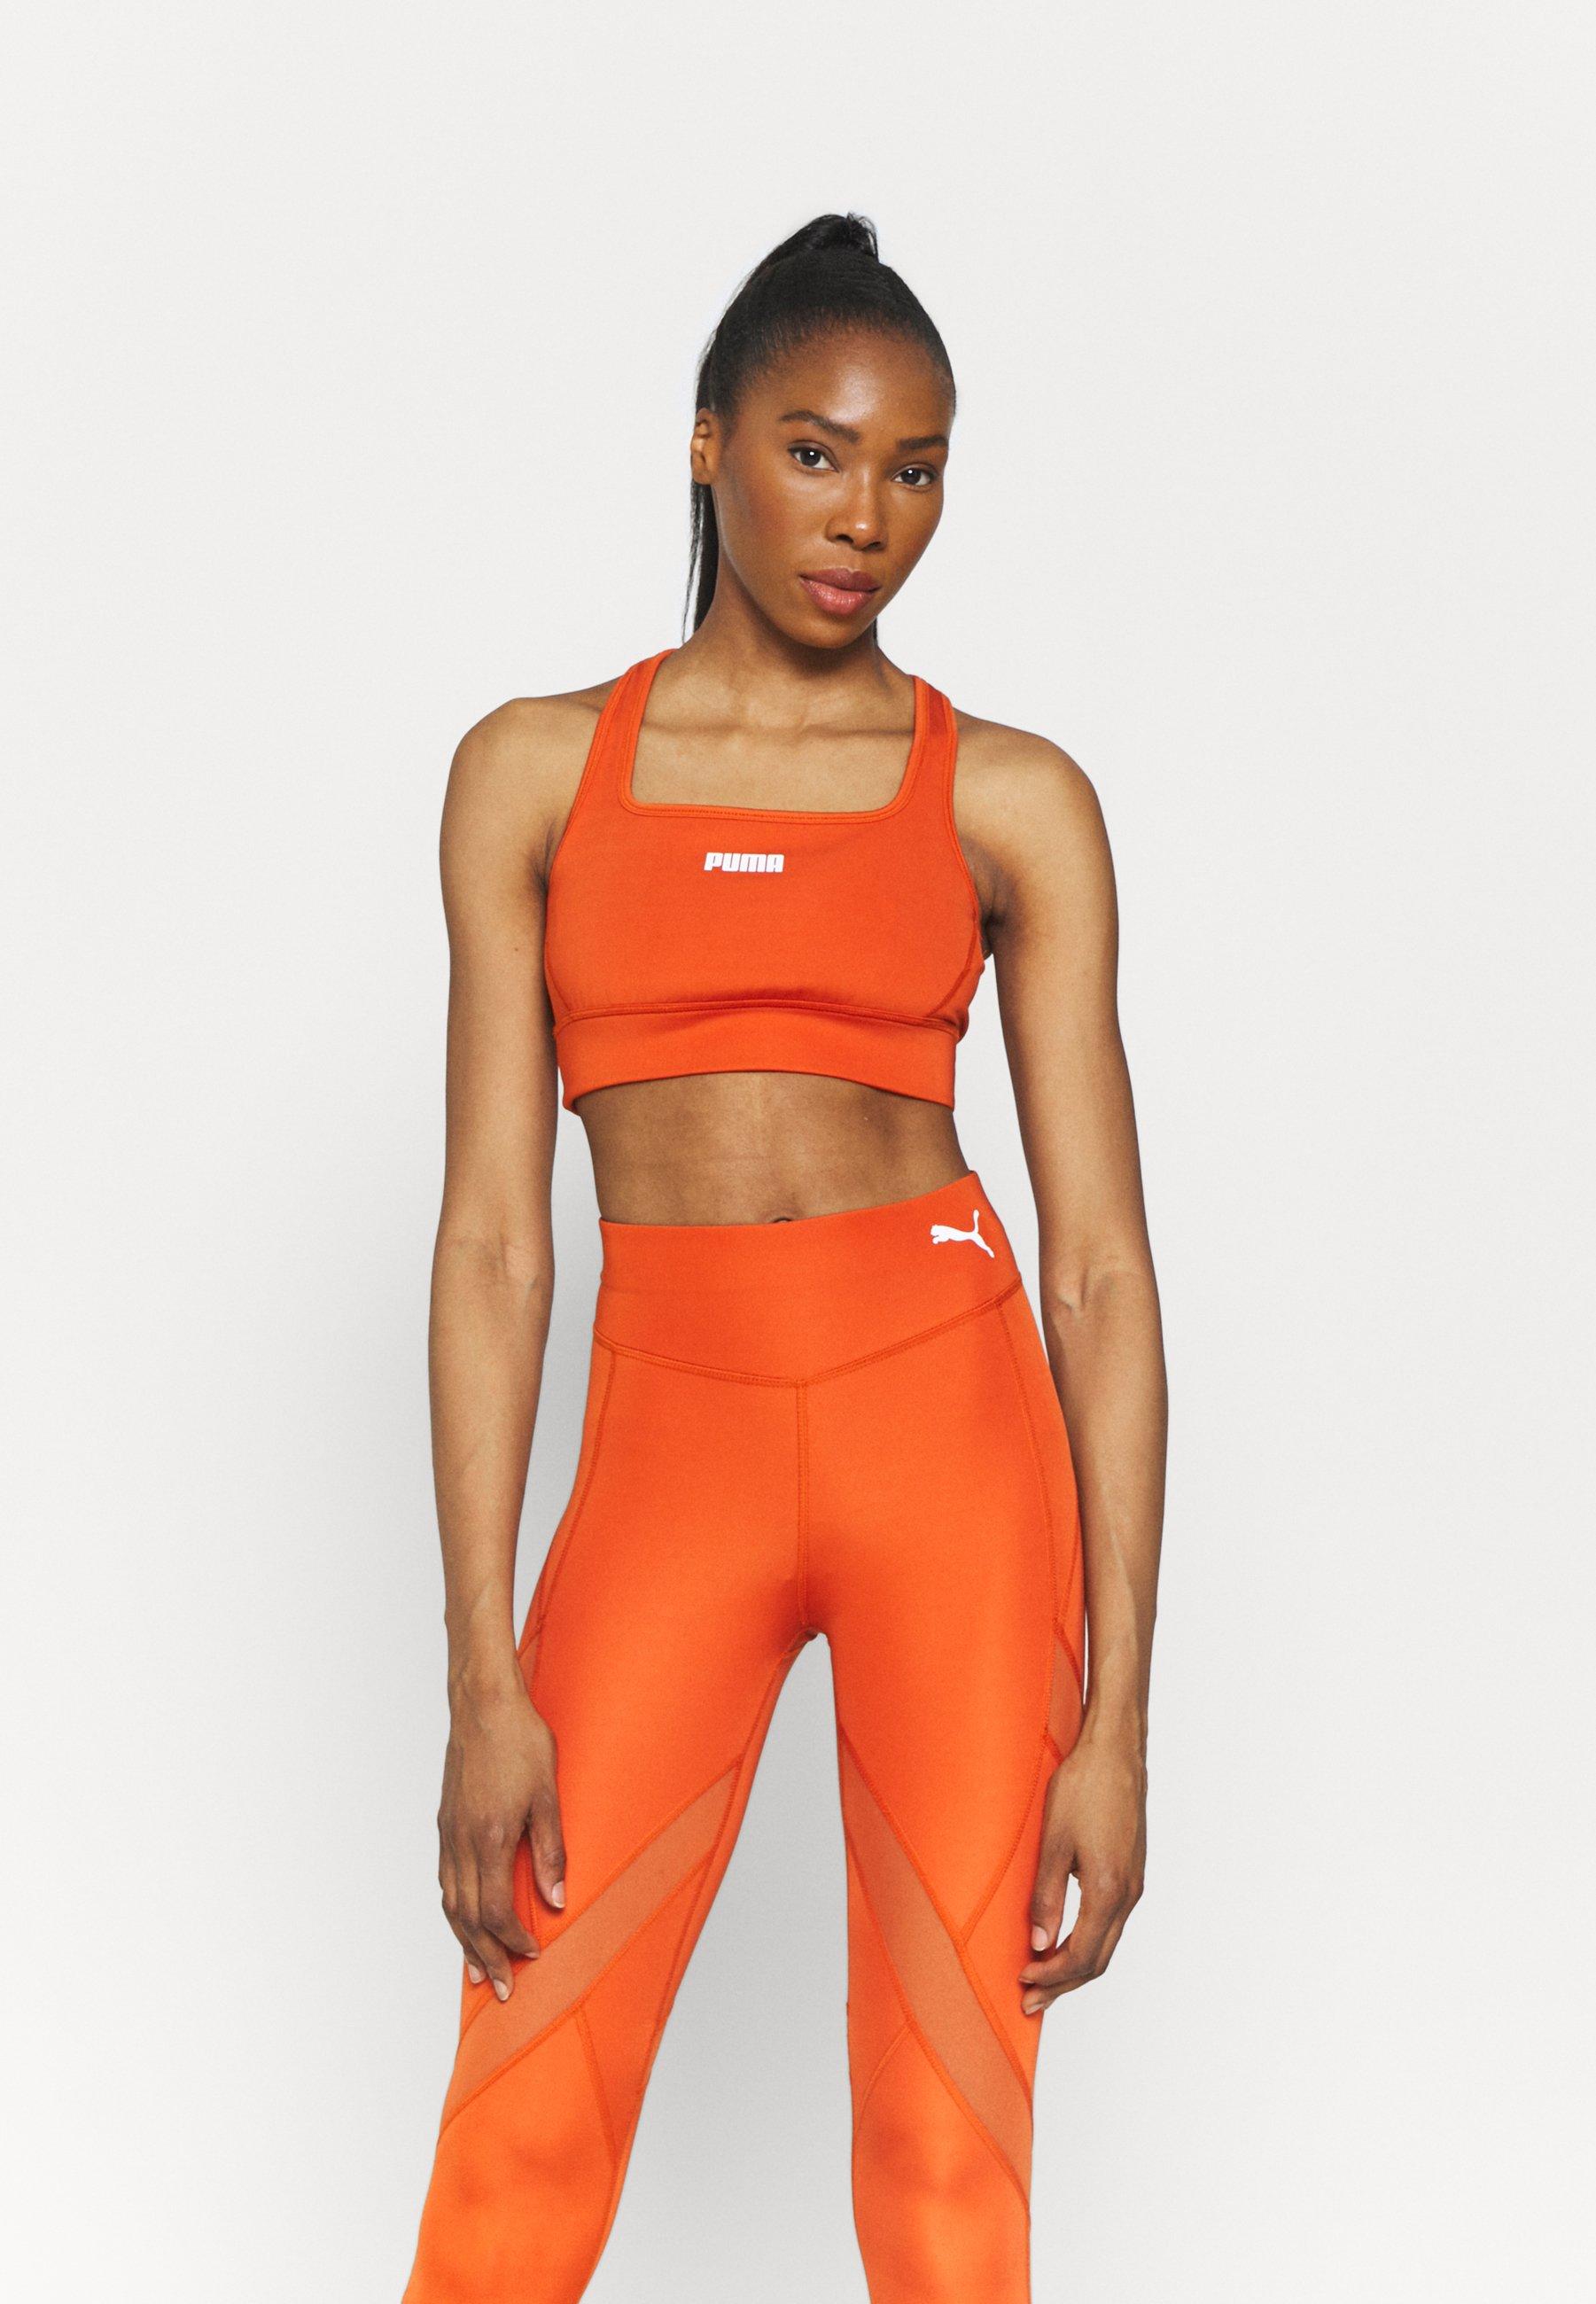 Women PAMELA REIF X PUMA SQUARE NECK BRA - Medium support sports bra